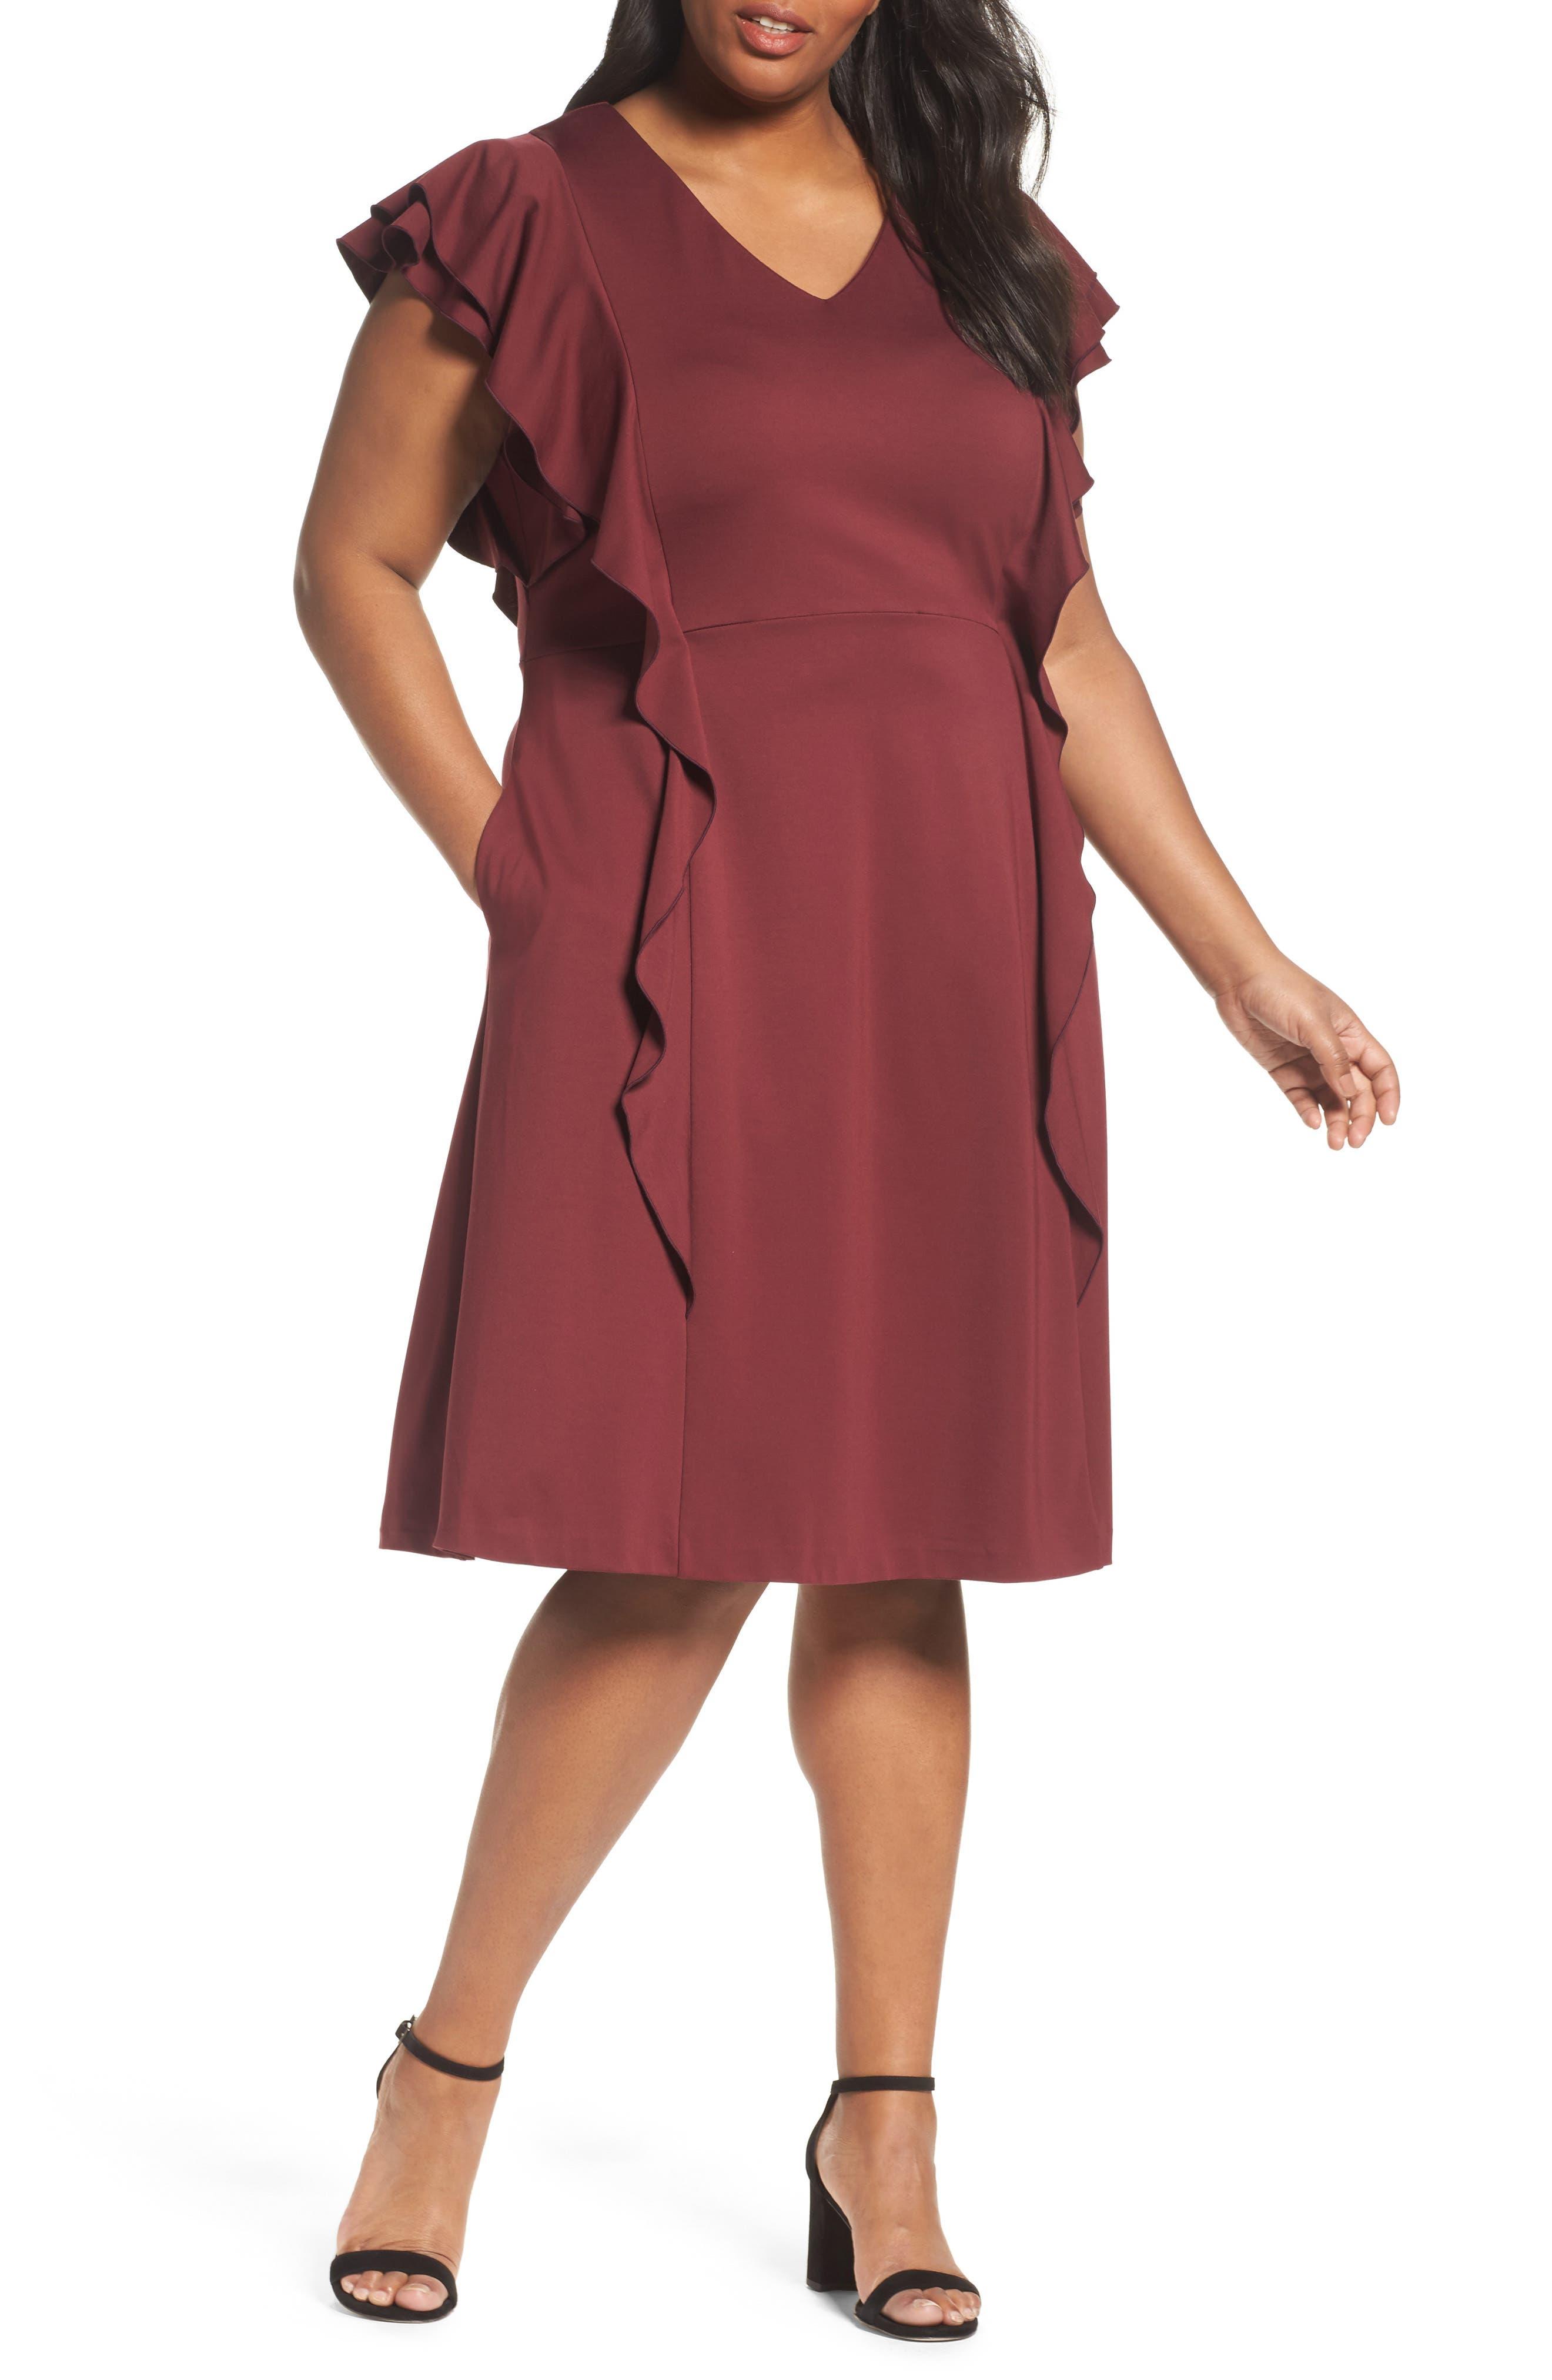 Alternate Image 1 Selected - Sejour Ruffle Ponte Dress (Plus Size)